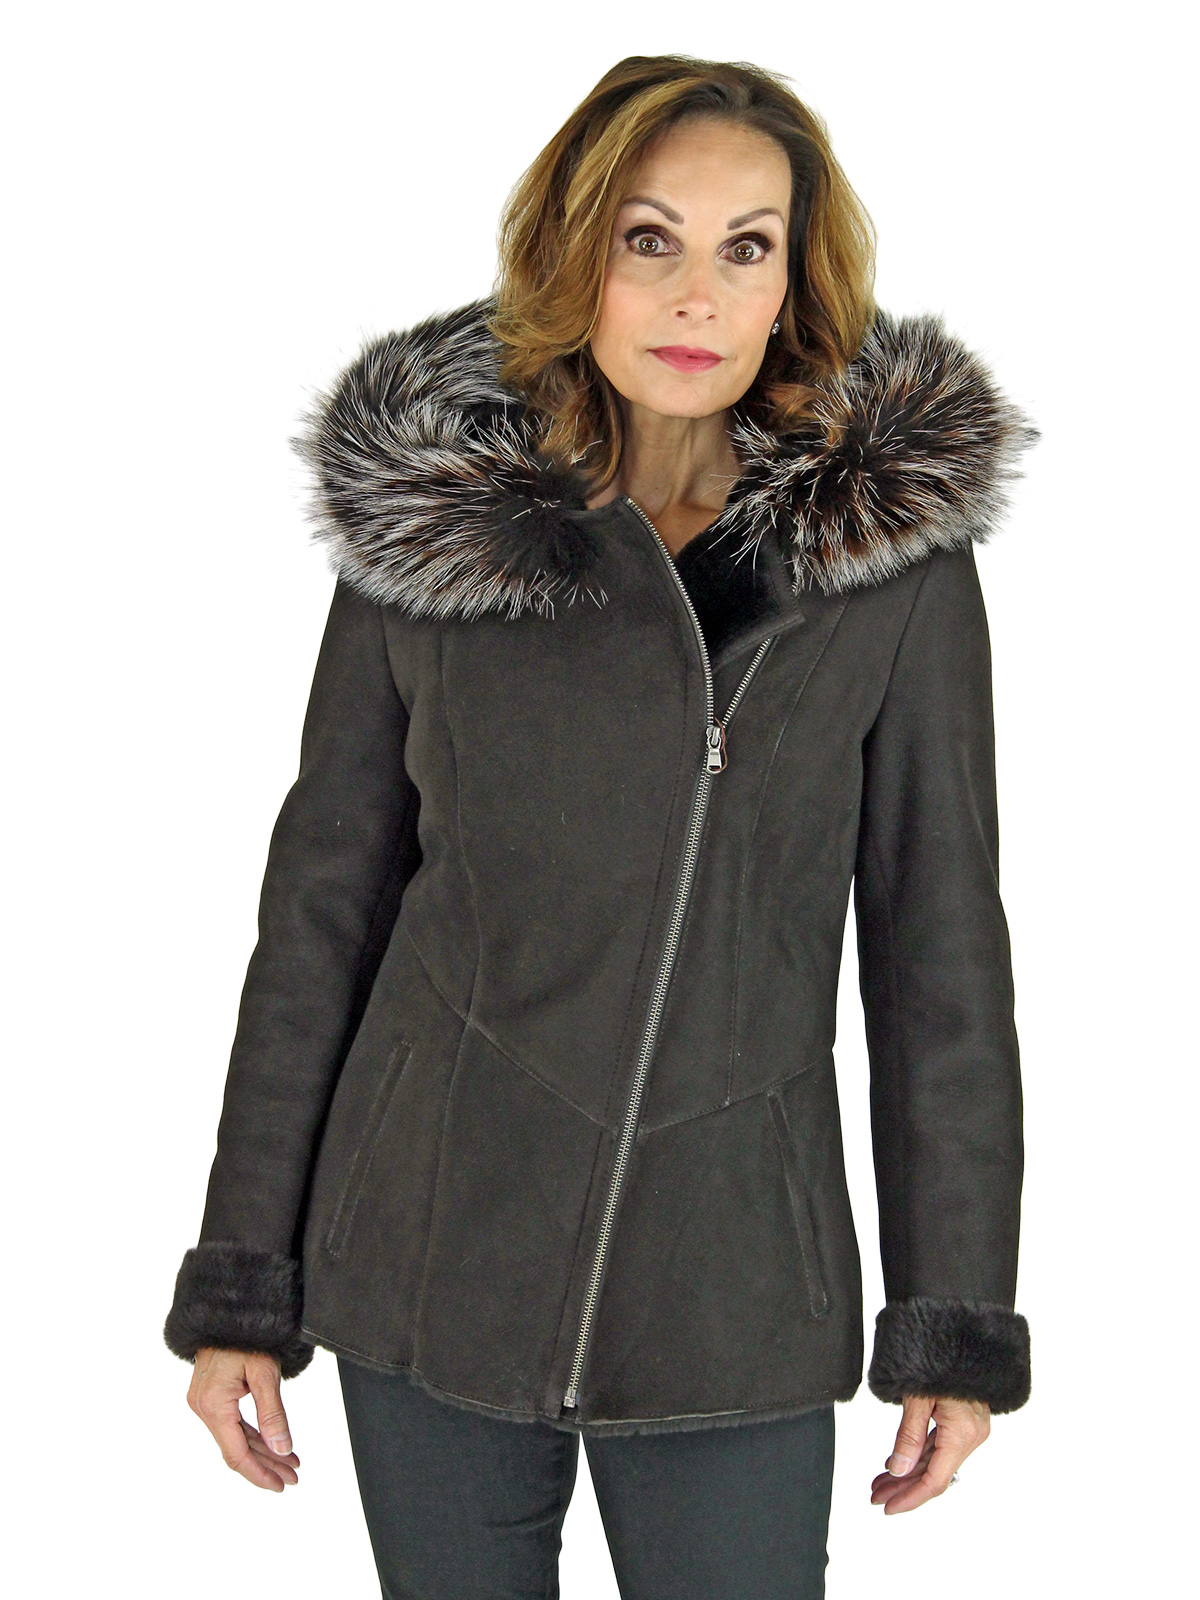 Woman's Brown Shearling Lamb Jacket with Mocha Fox Fur Trimmed Hood